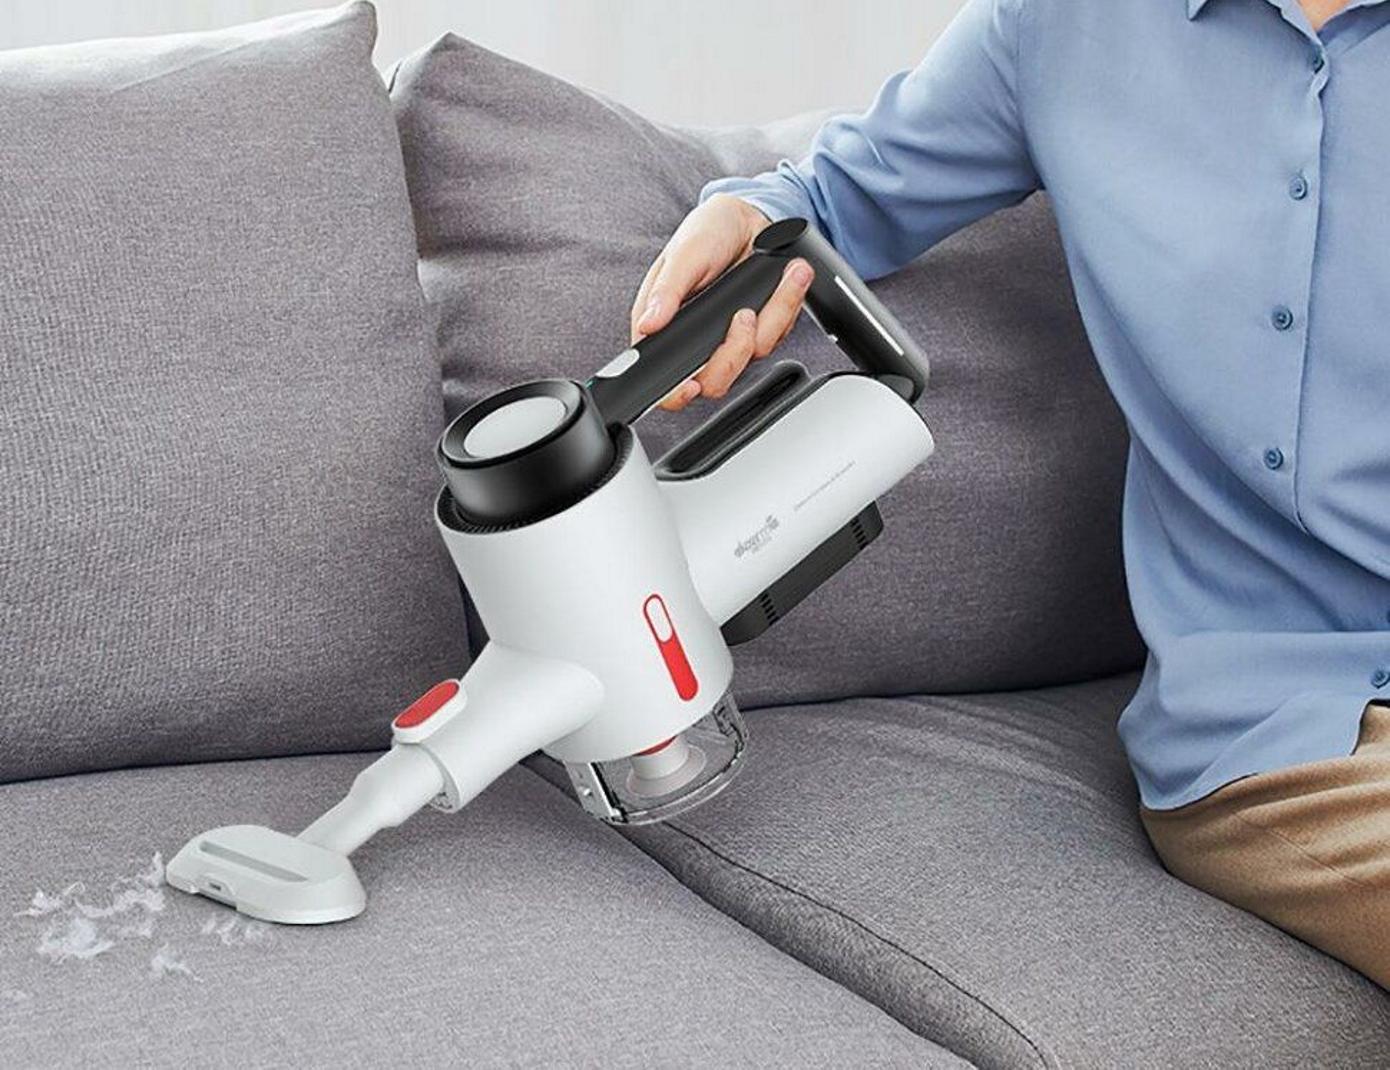 Opisanie Besprovodnoj Ruchnoj Pylesos Xiaomi Deerma Wireless Vacuum Cleaner Vc40 6